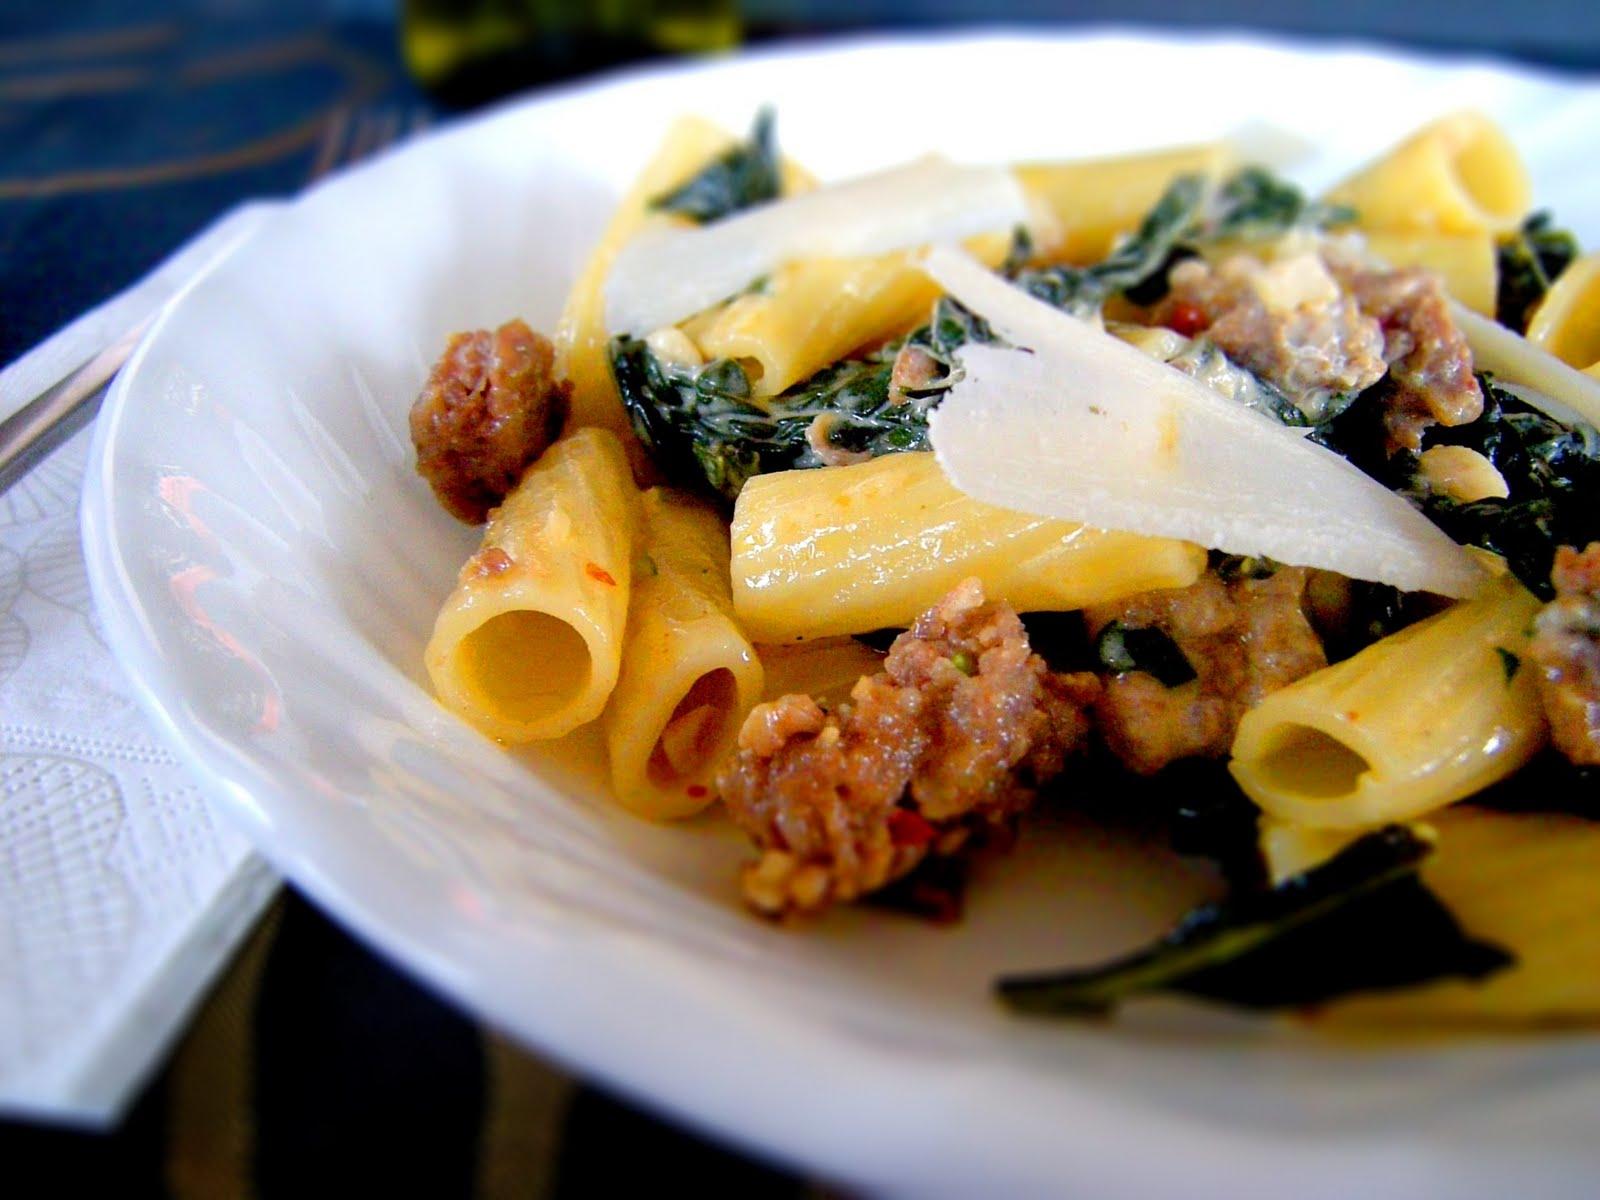 Crafty Lass: Pasta with Kale, Sausage & Cream